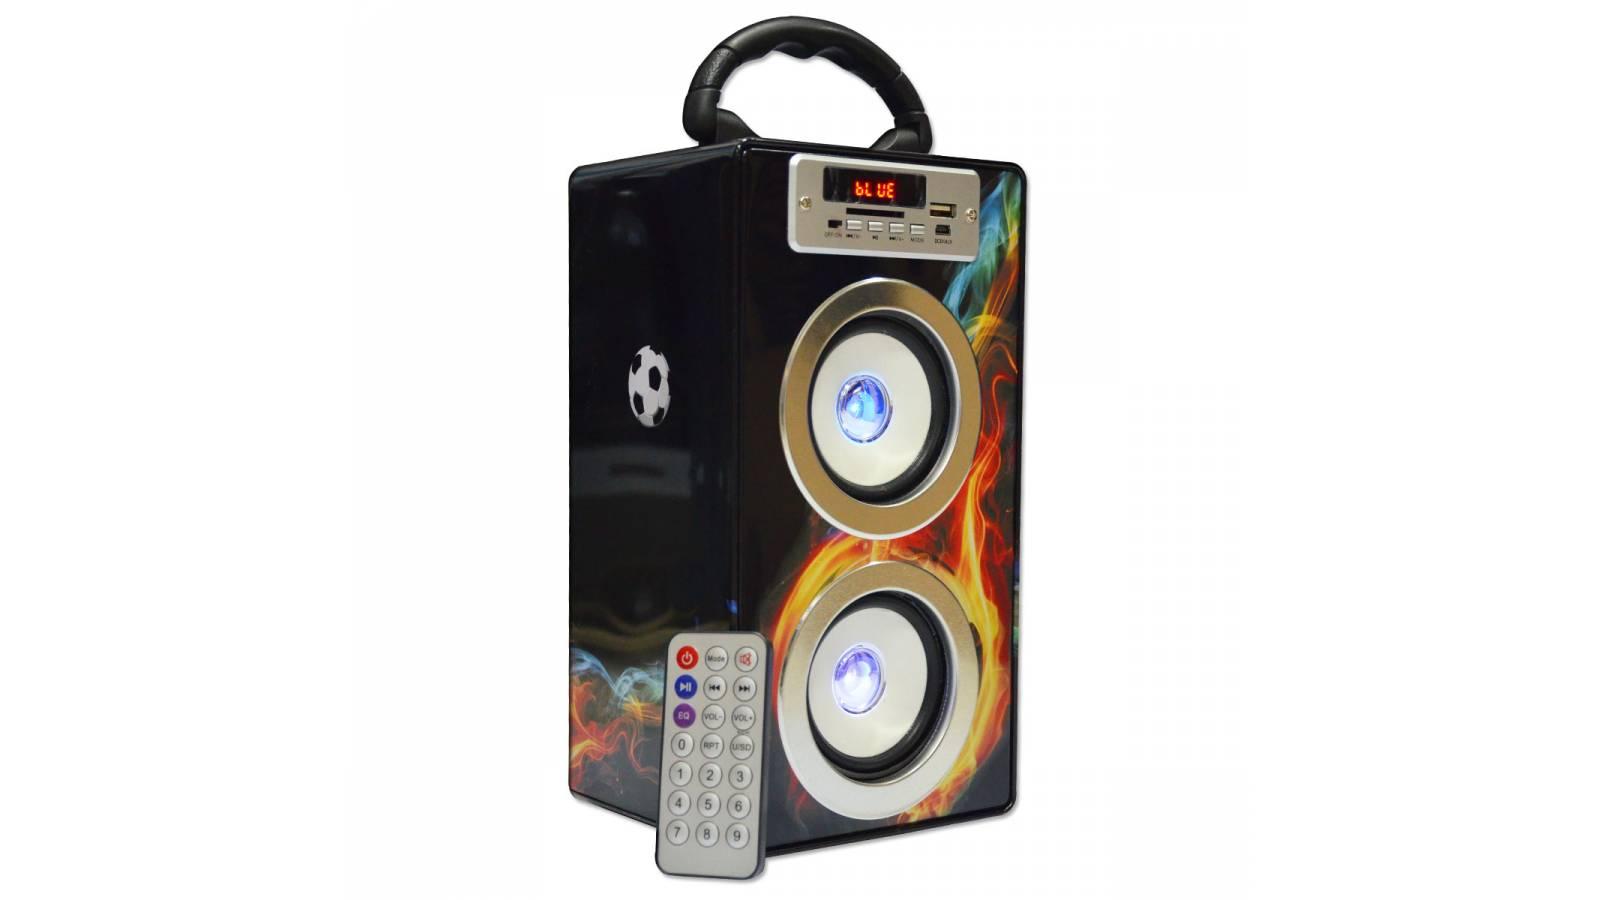 Parlante Portátil Estéreo C/control Usb Sd Y Fm + Bluetooth Oferta